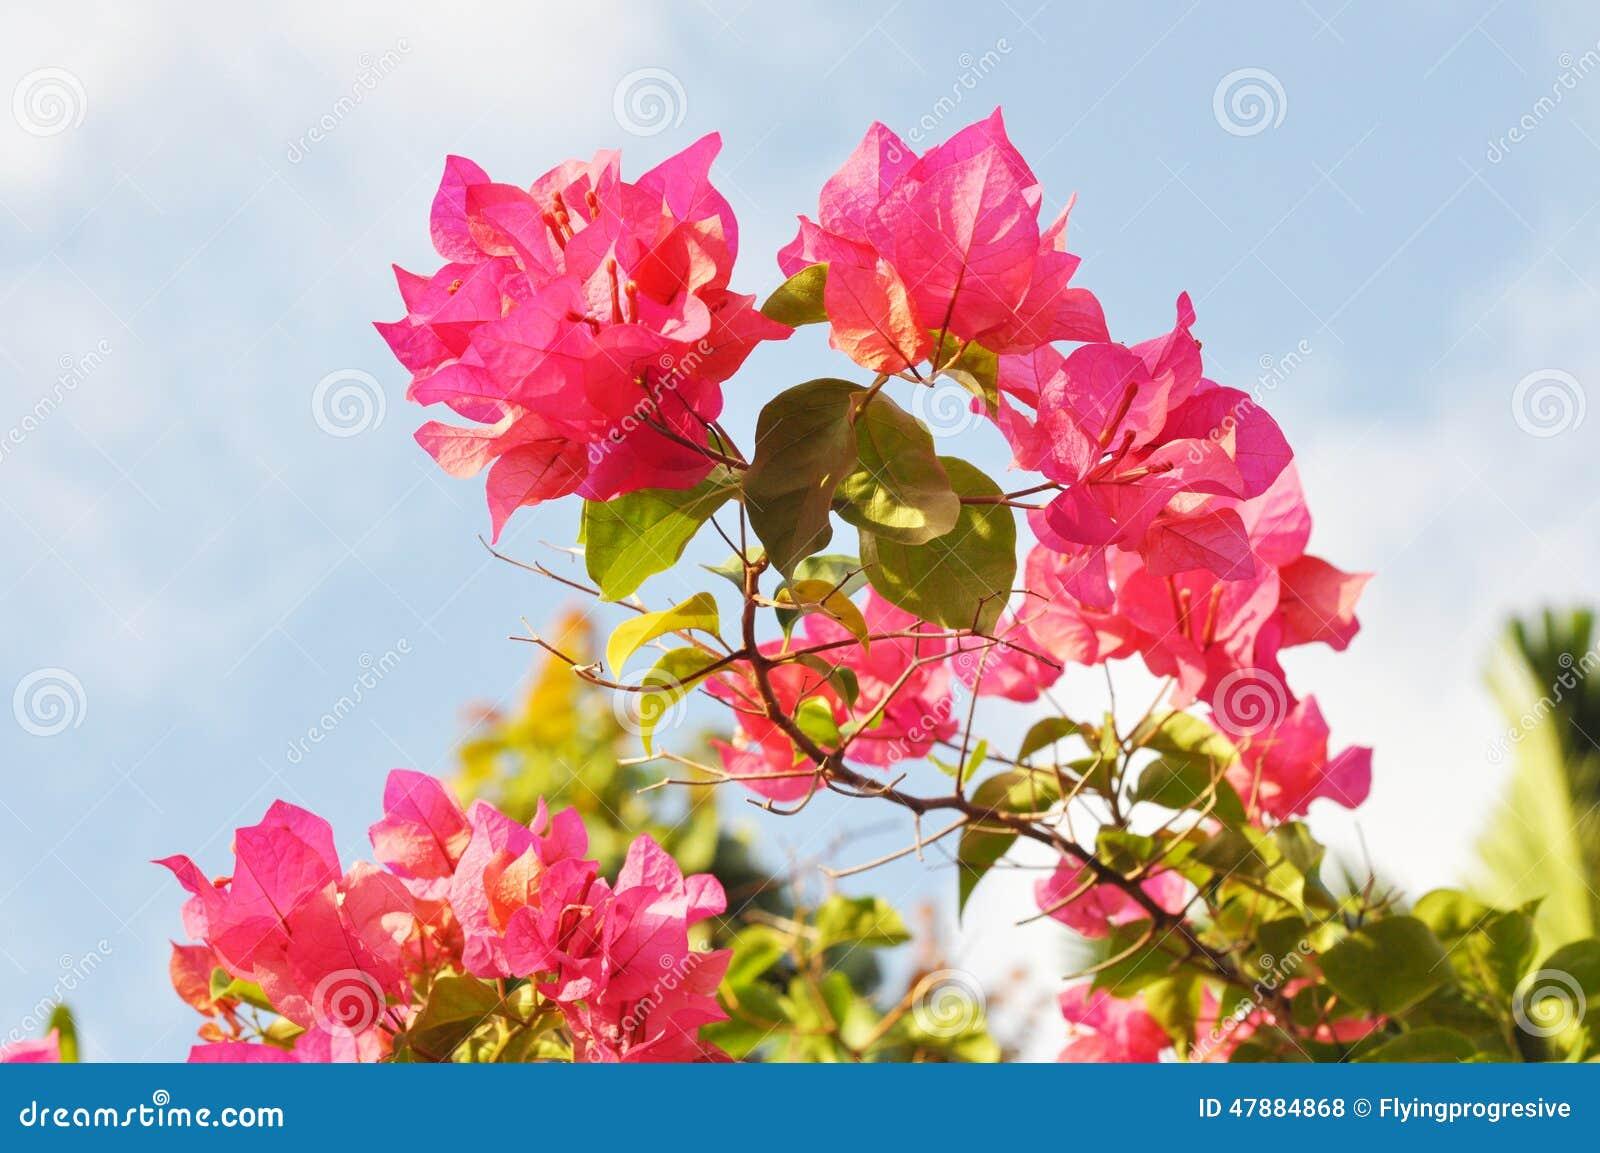 Pink Bougainvillea Flower Stock Photo - Image: 47884868